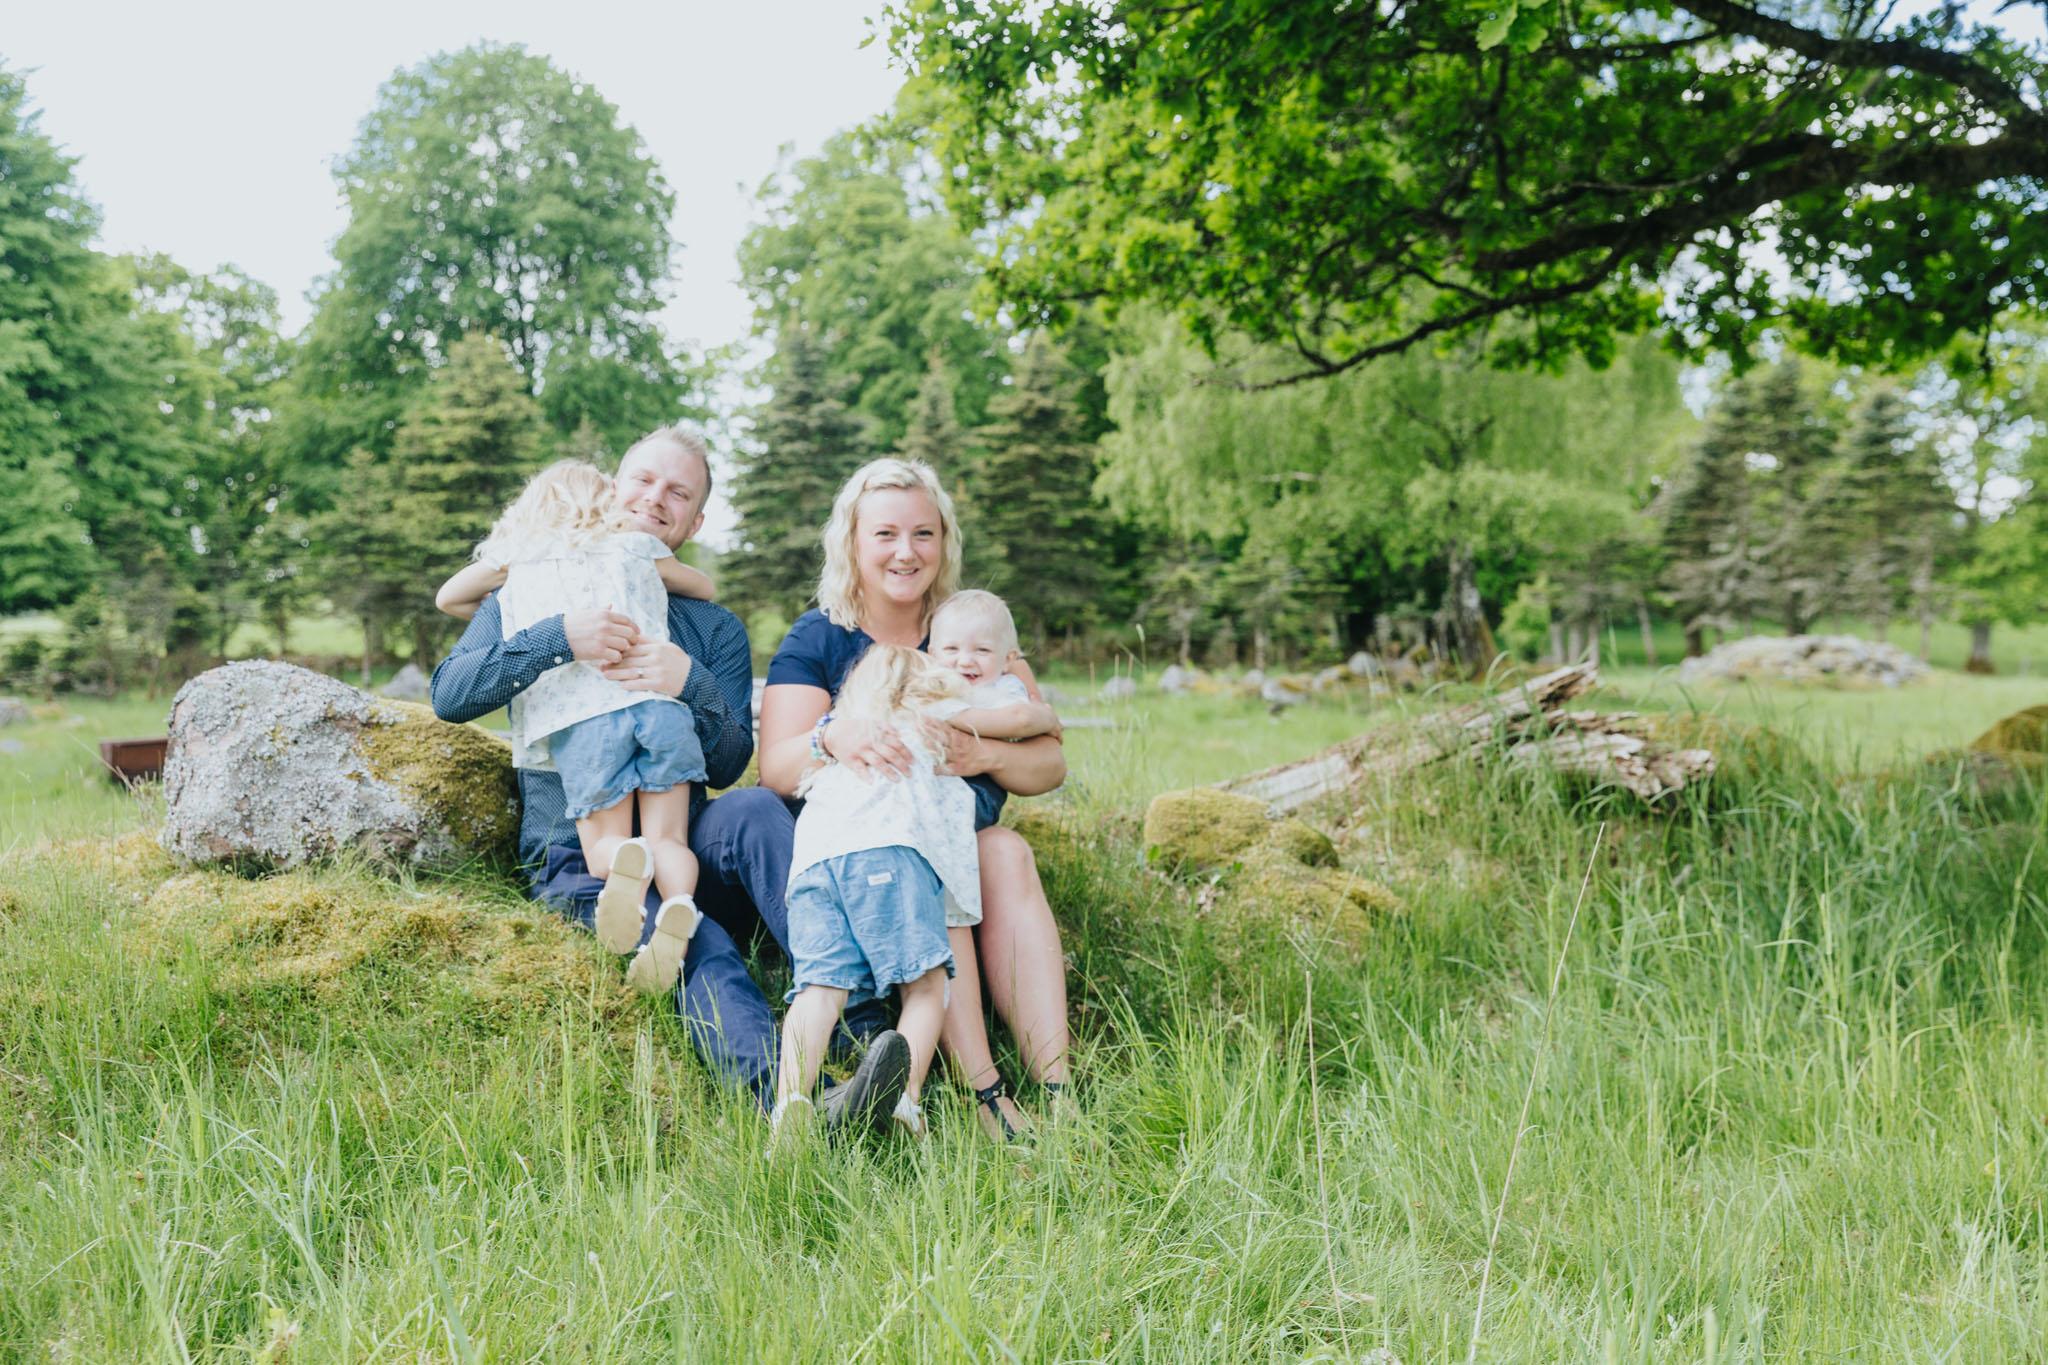 2018 05 20  Familjefotografering Almarsson, Fotograf Emy, 07.jpg